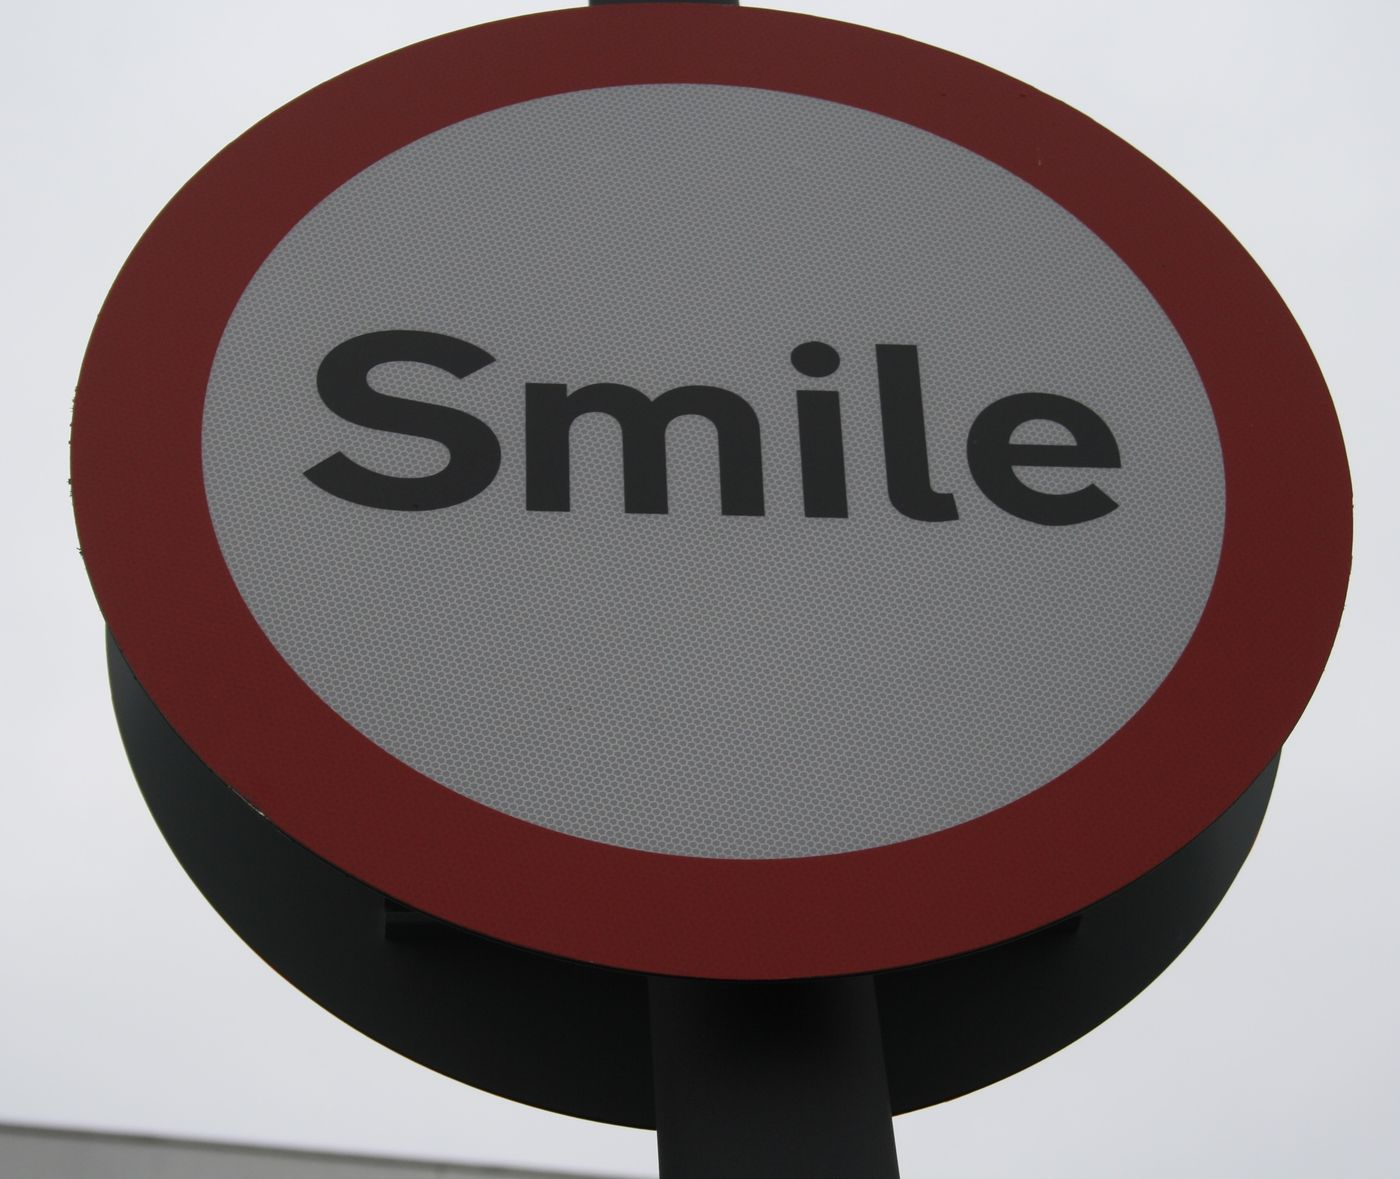 Smile at the end | © Heinz-Dieter Klauß